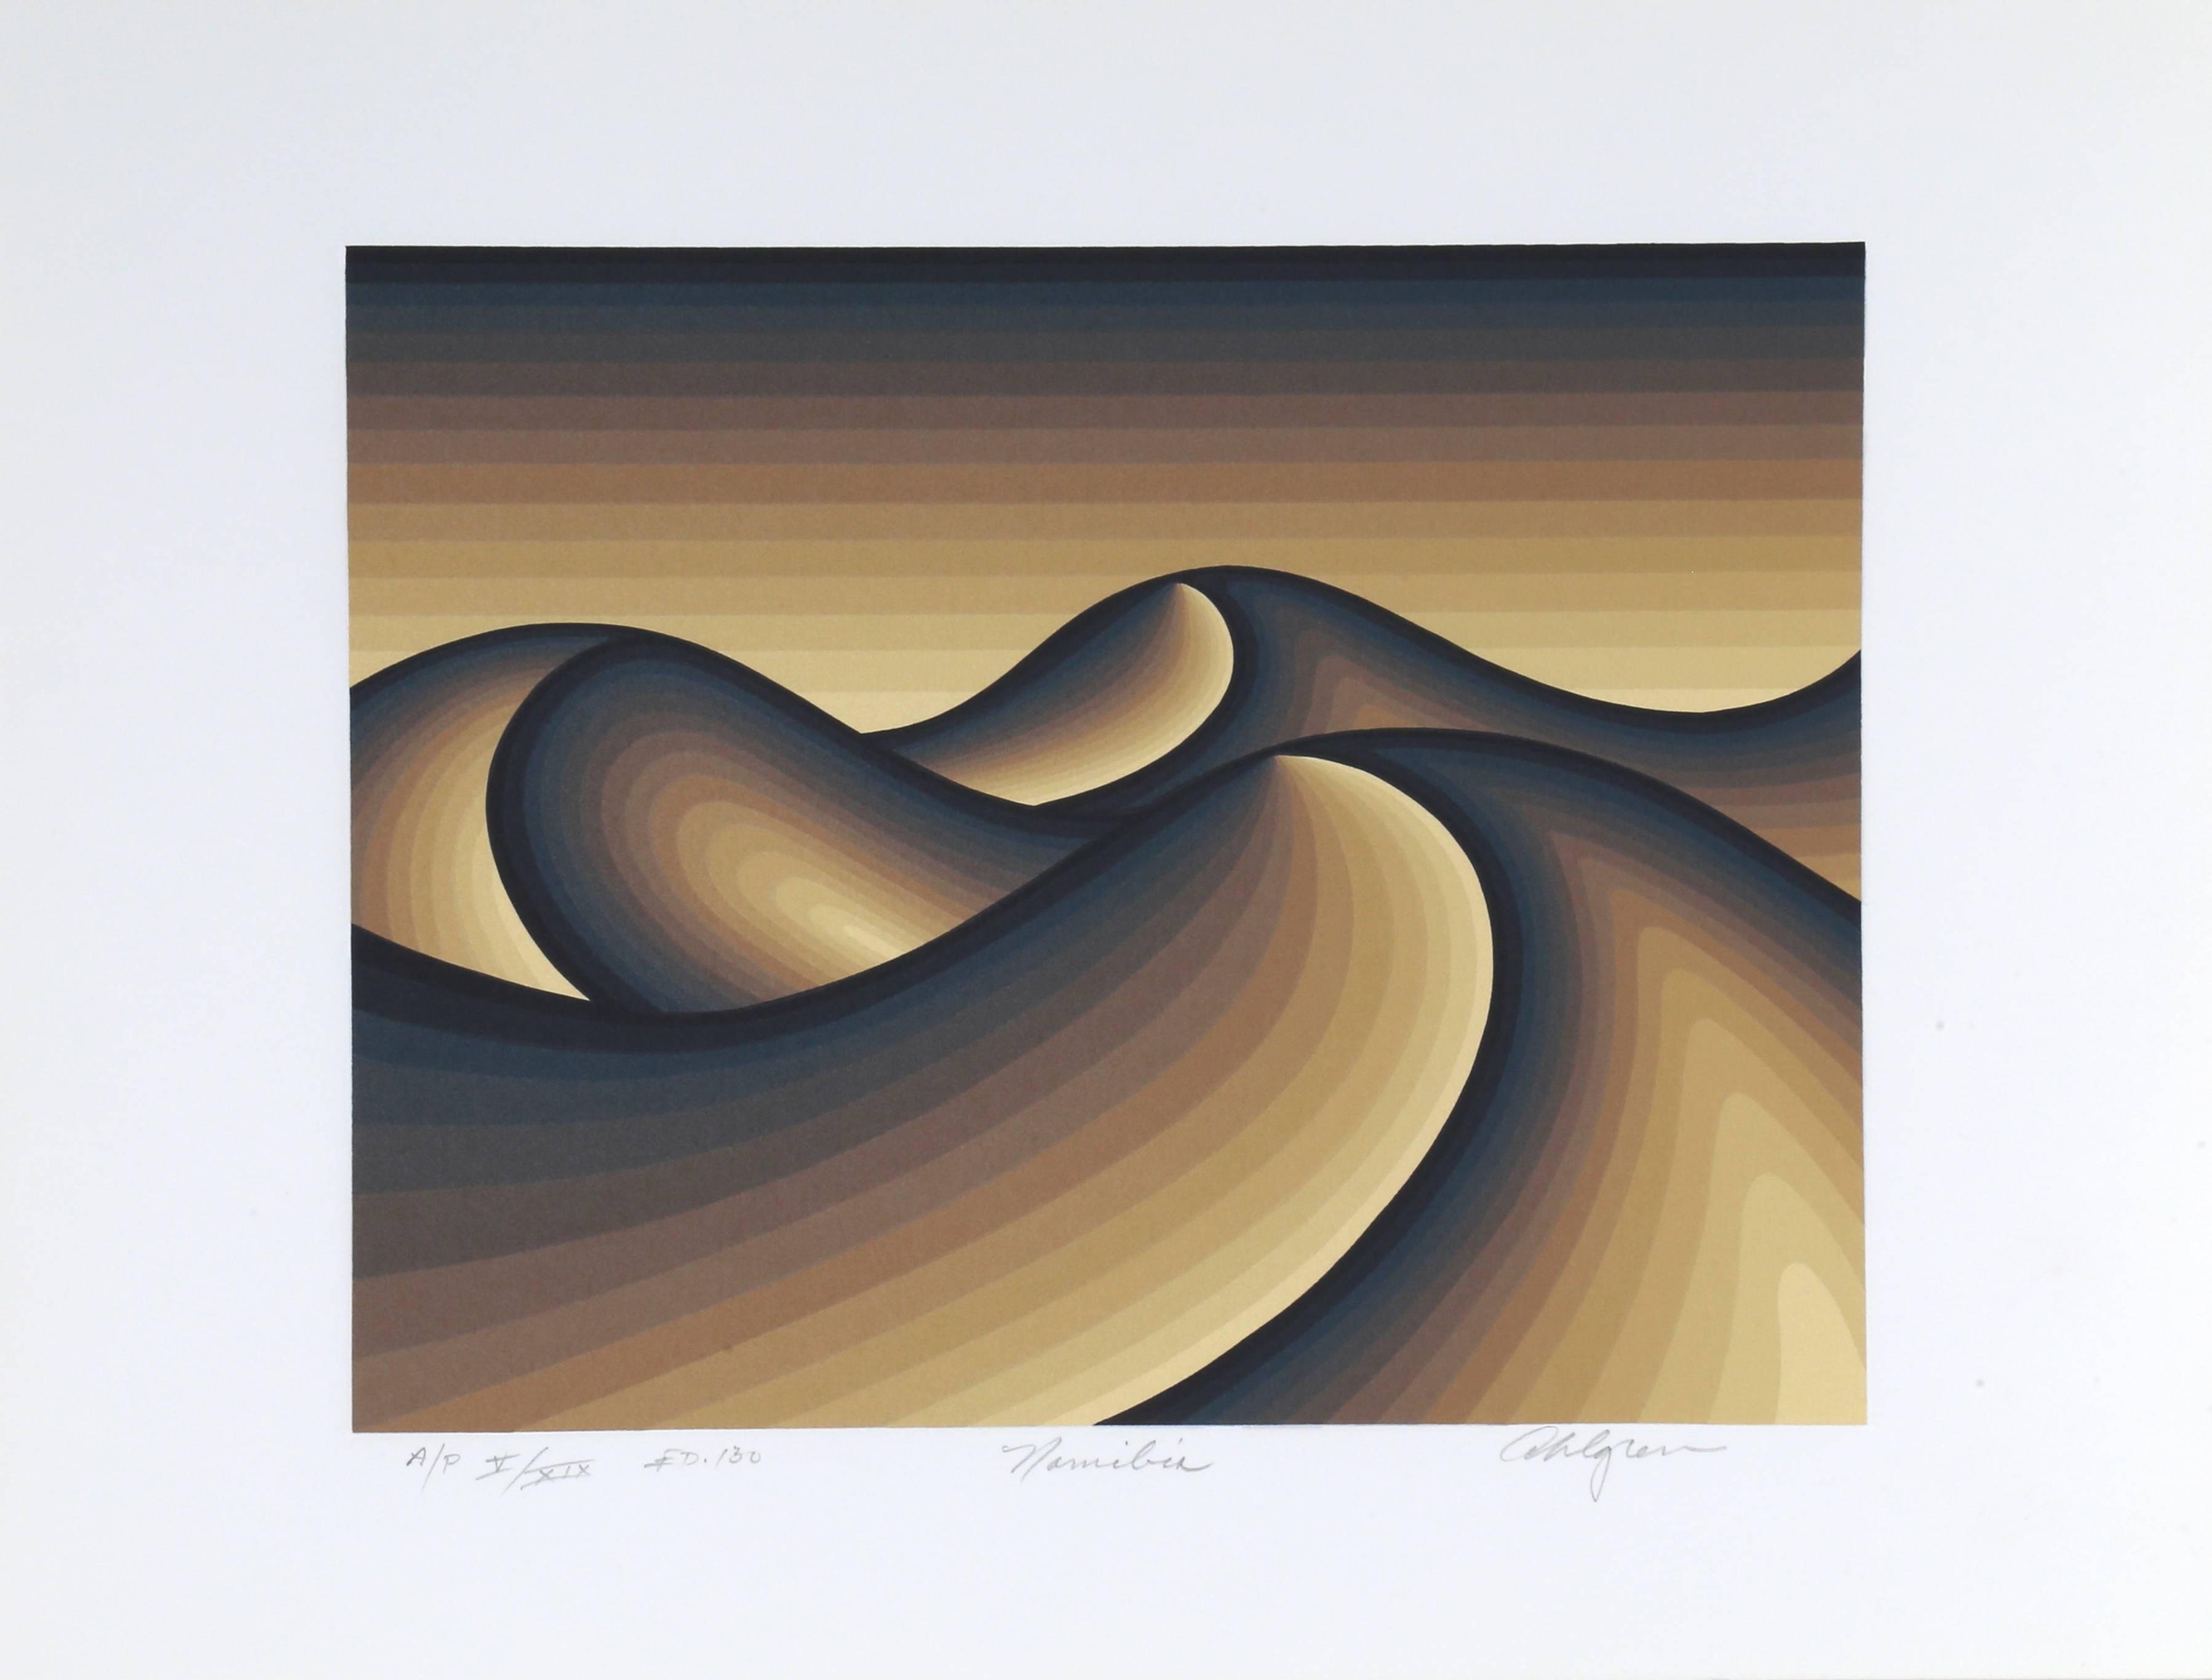 """Namibia"", Abstract Silkscreen by Roy Ahlgren"